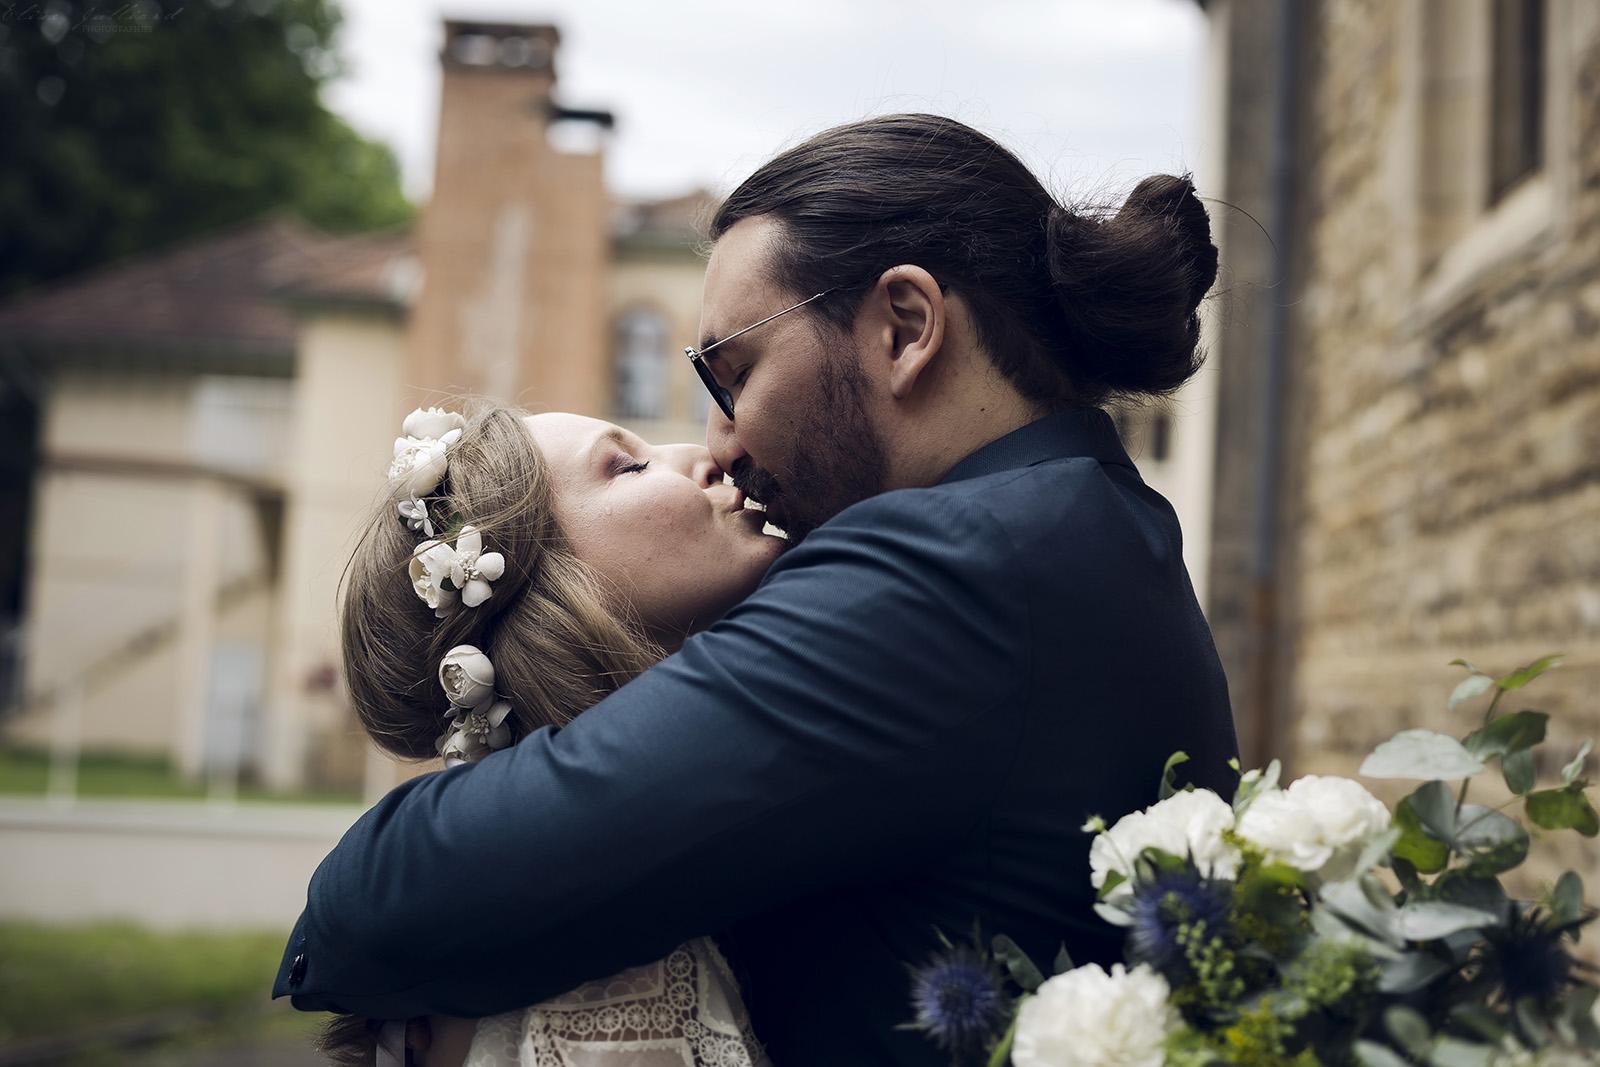 mariage-wedding-photographe-photographer-reportage-seance-photo-couple-amoureux-amour-famille-domaine-du-petit-chambard-auvergne-rhone-alpes-ain-lyon-bourg-en-bresse-elise-julliard-2